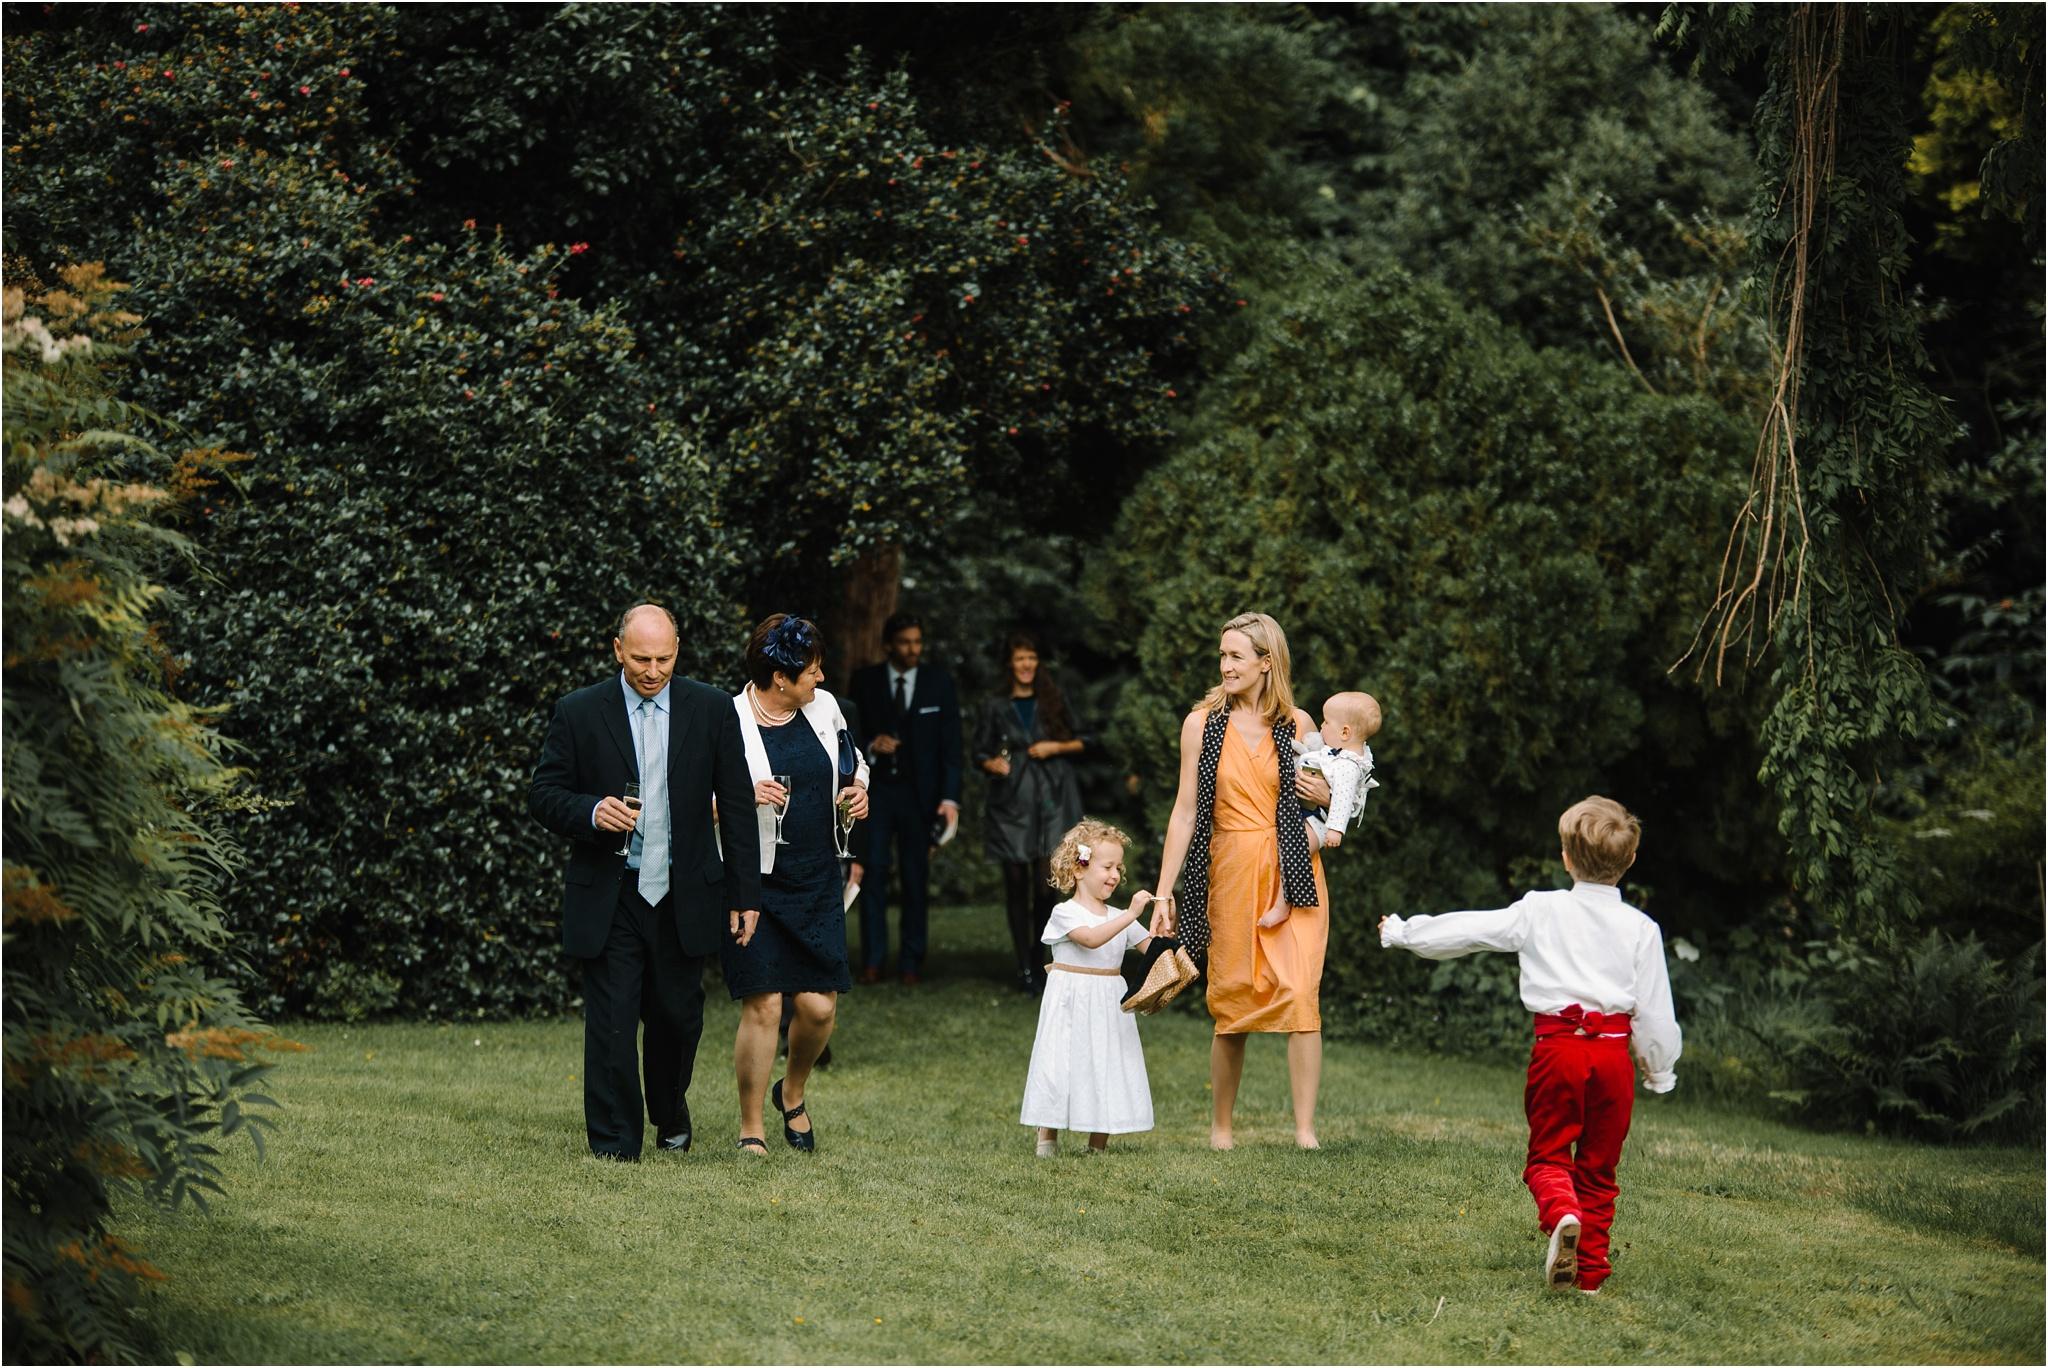 Outdoor-country-wedding-Edinburgh-photographer__0045.jpg